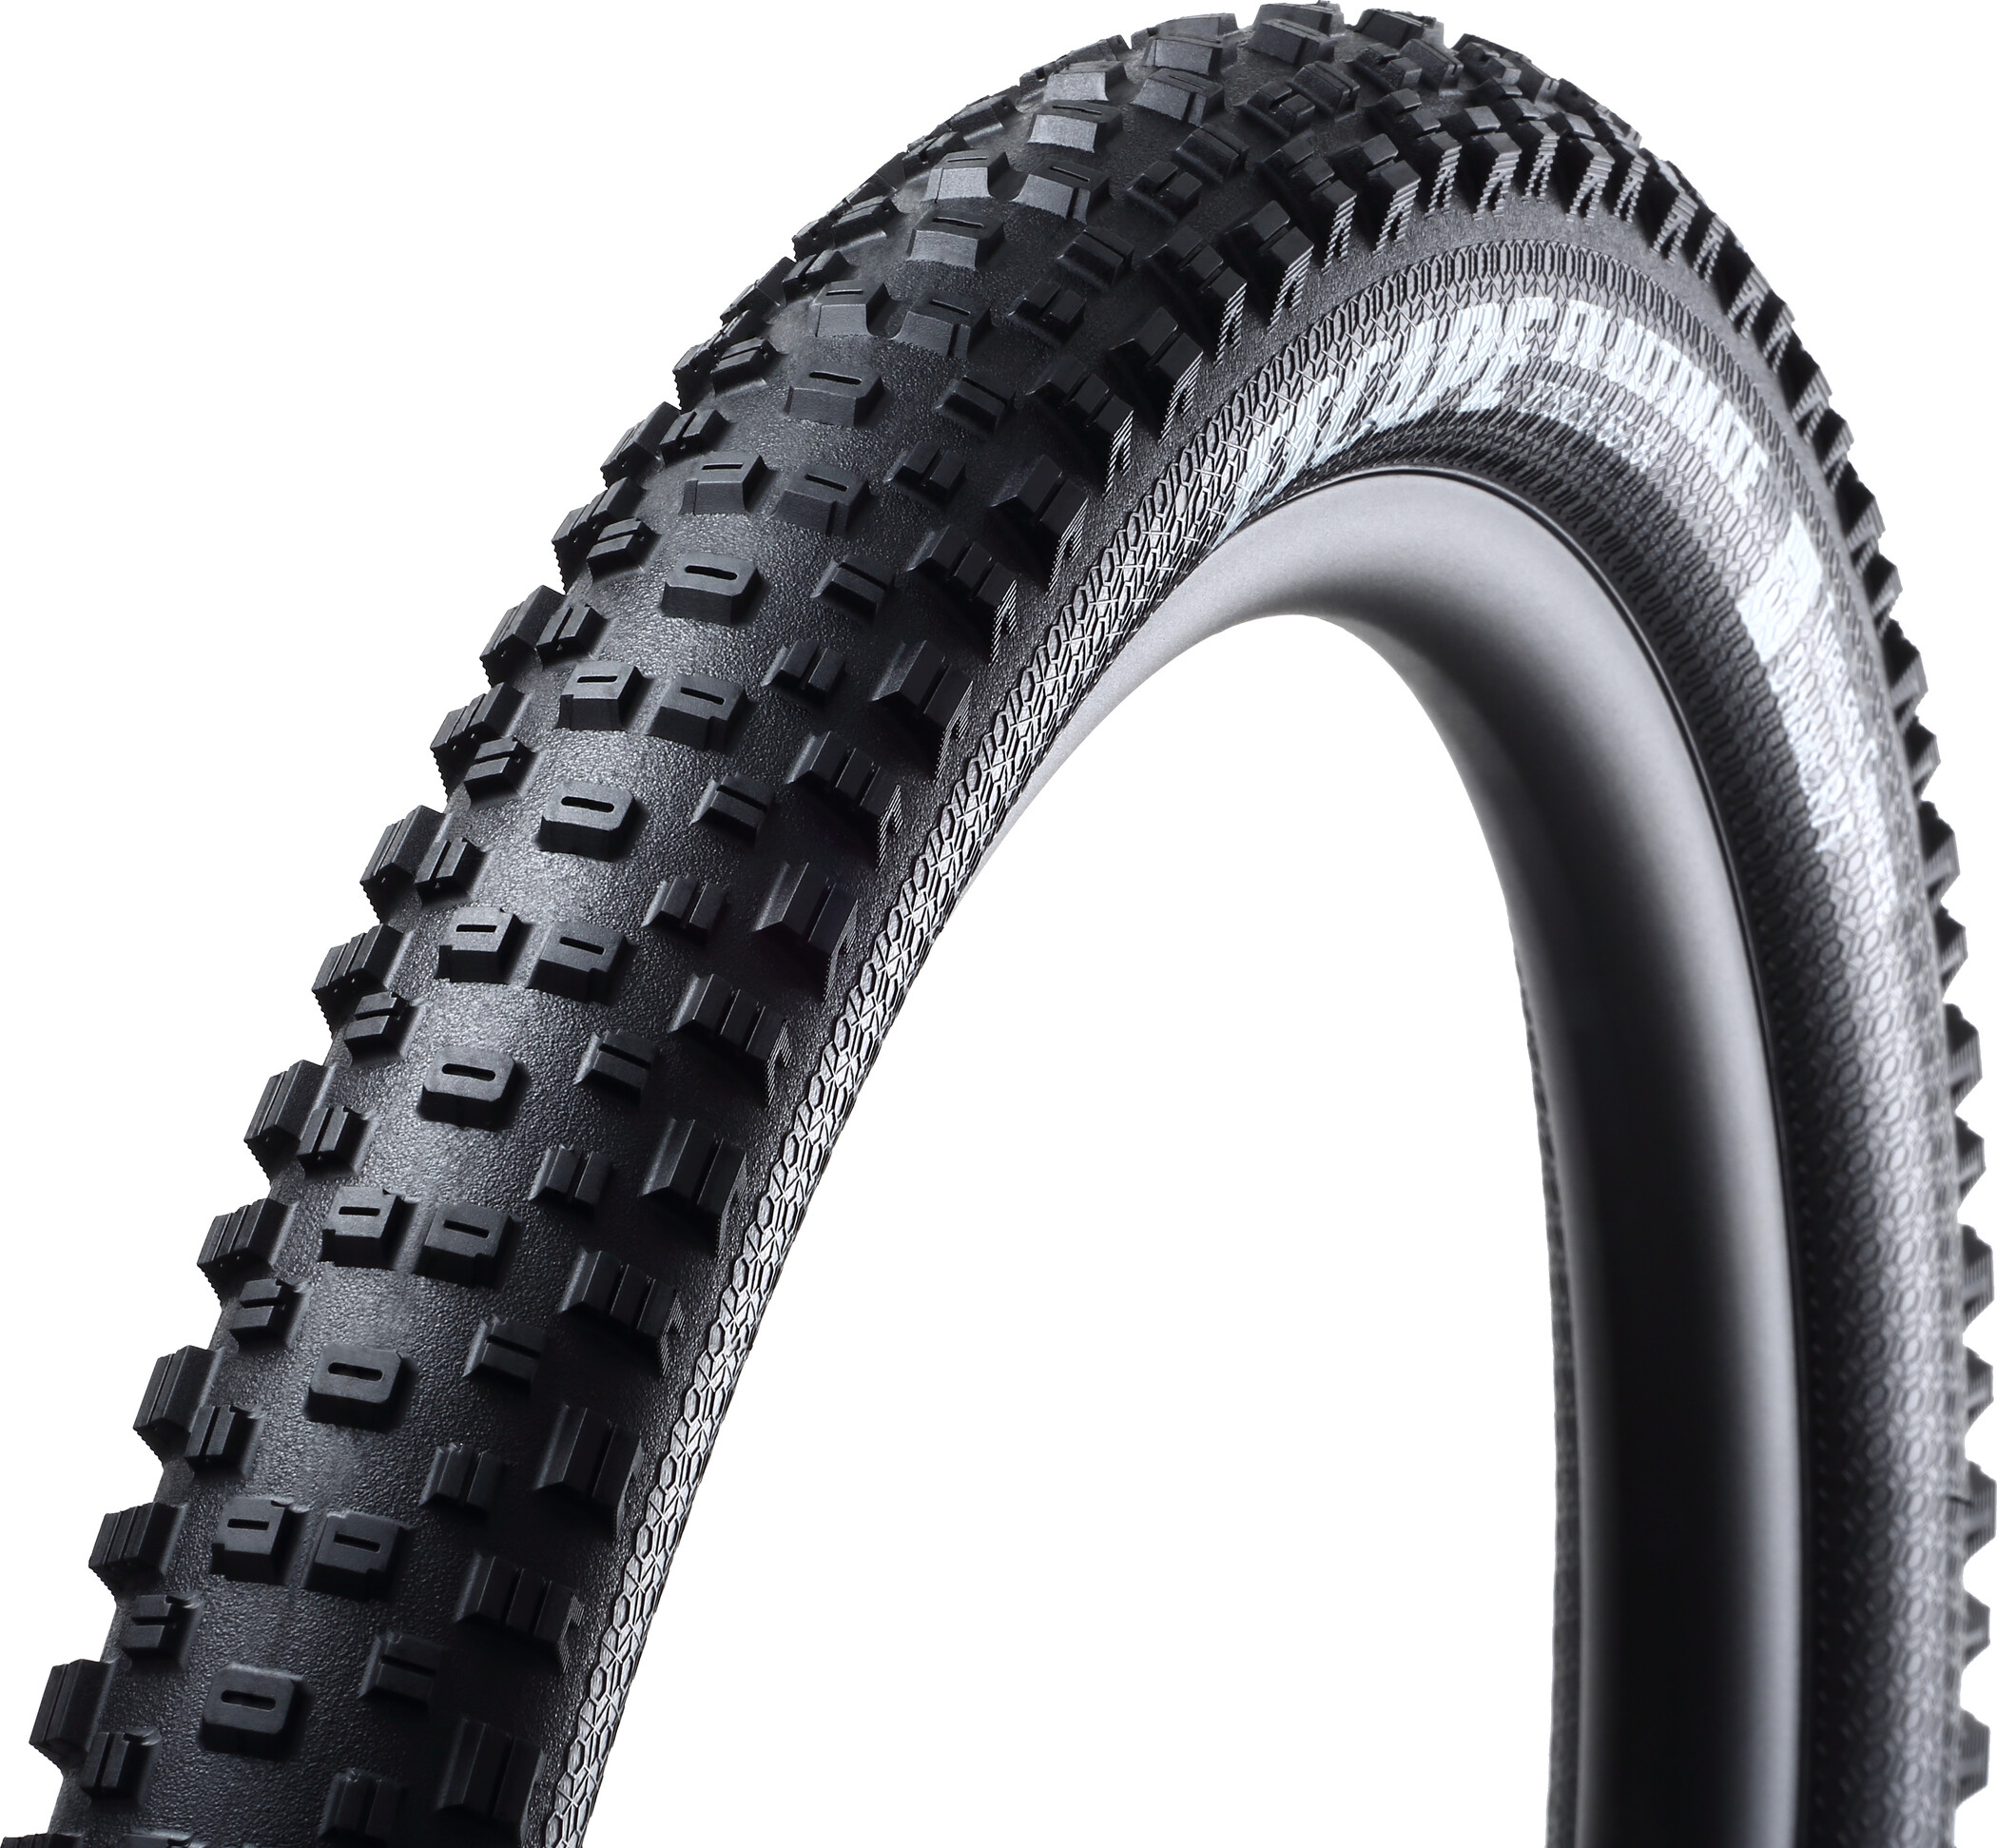 Goodyear Escape Premium Foldedæk 60-584 Tubeless Complete Dynamic R/T e25, black (2019)   Tyres